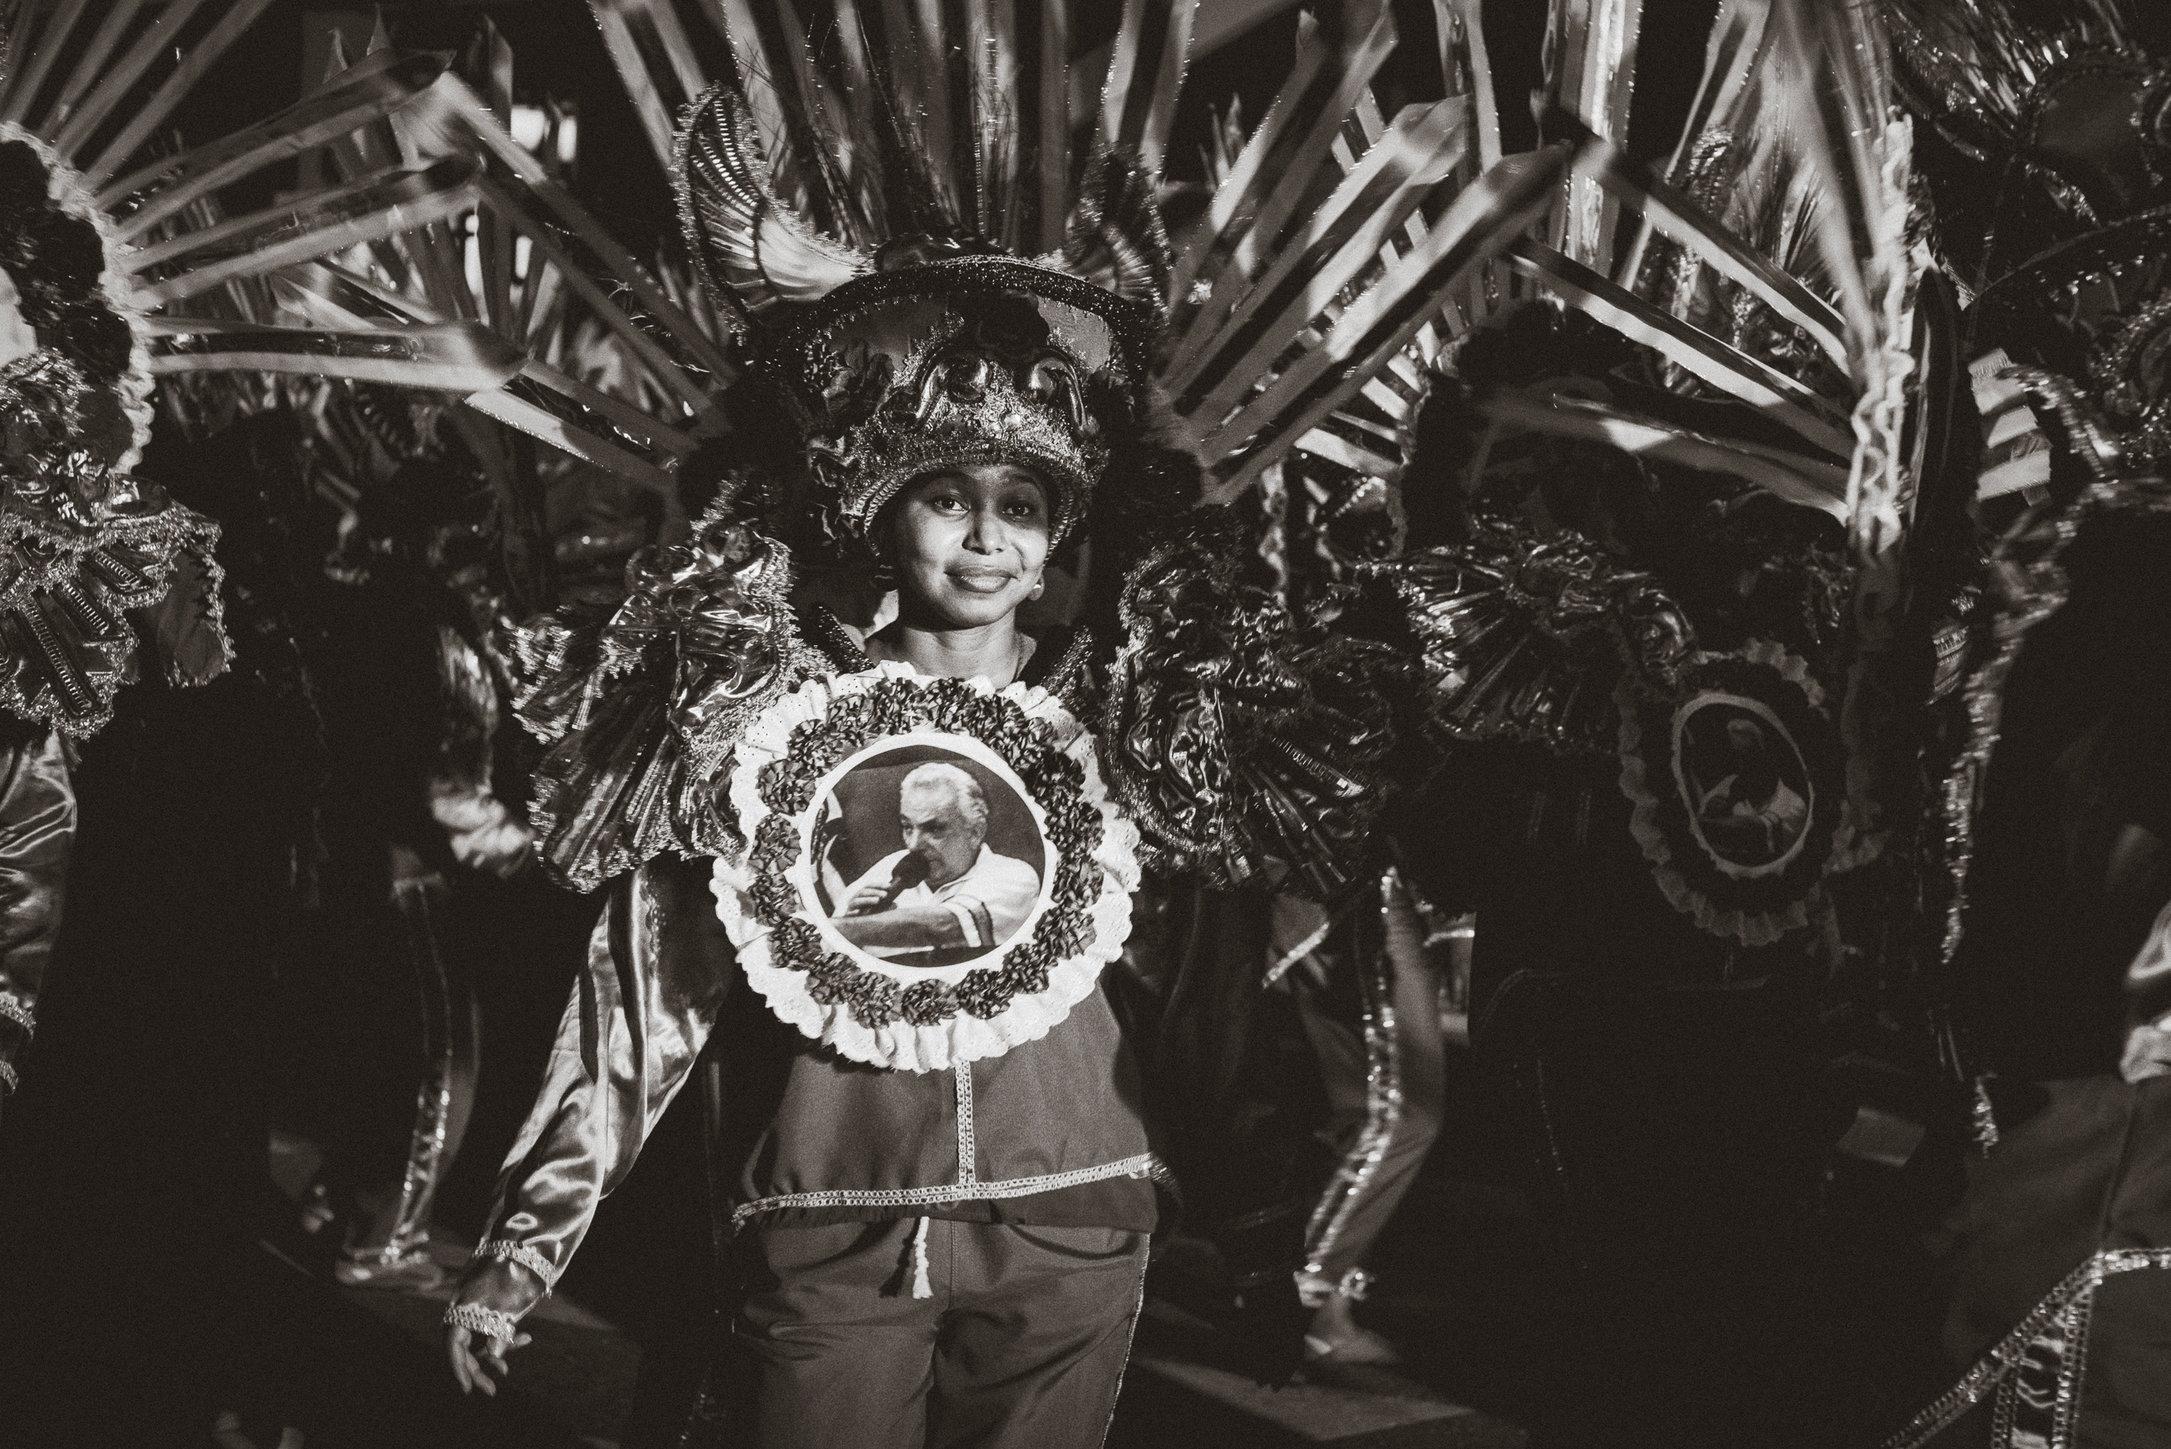 20180211-Carnaval-98.jpg